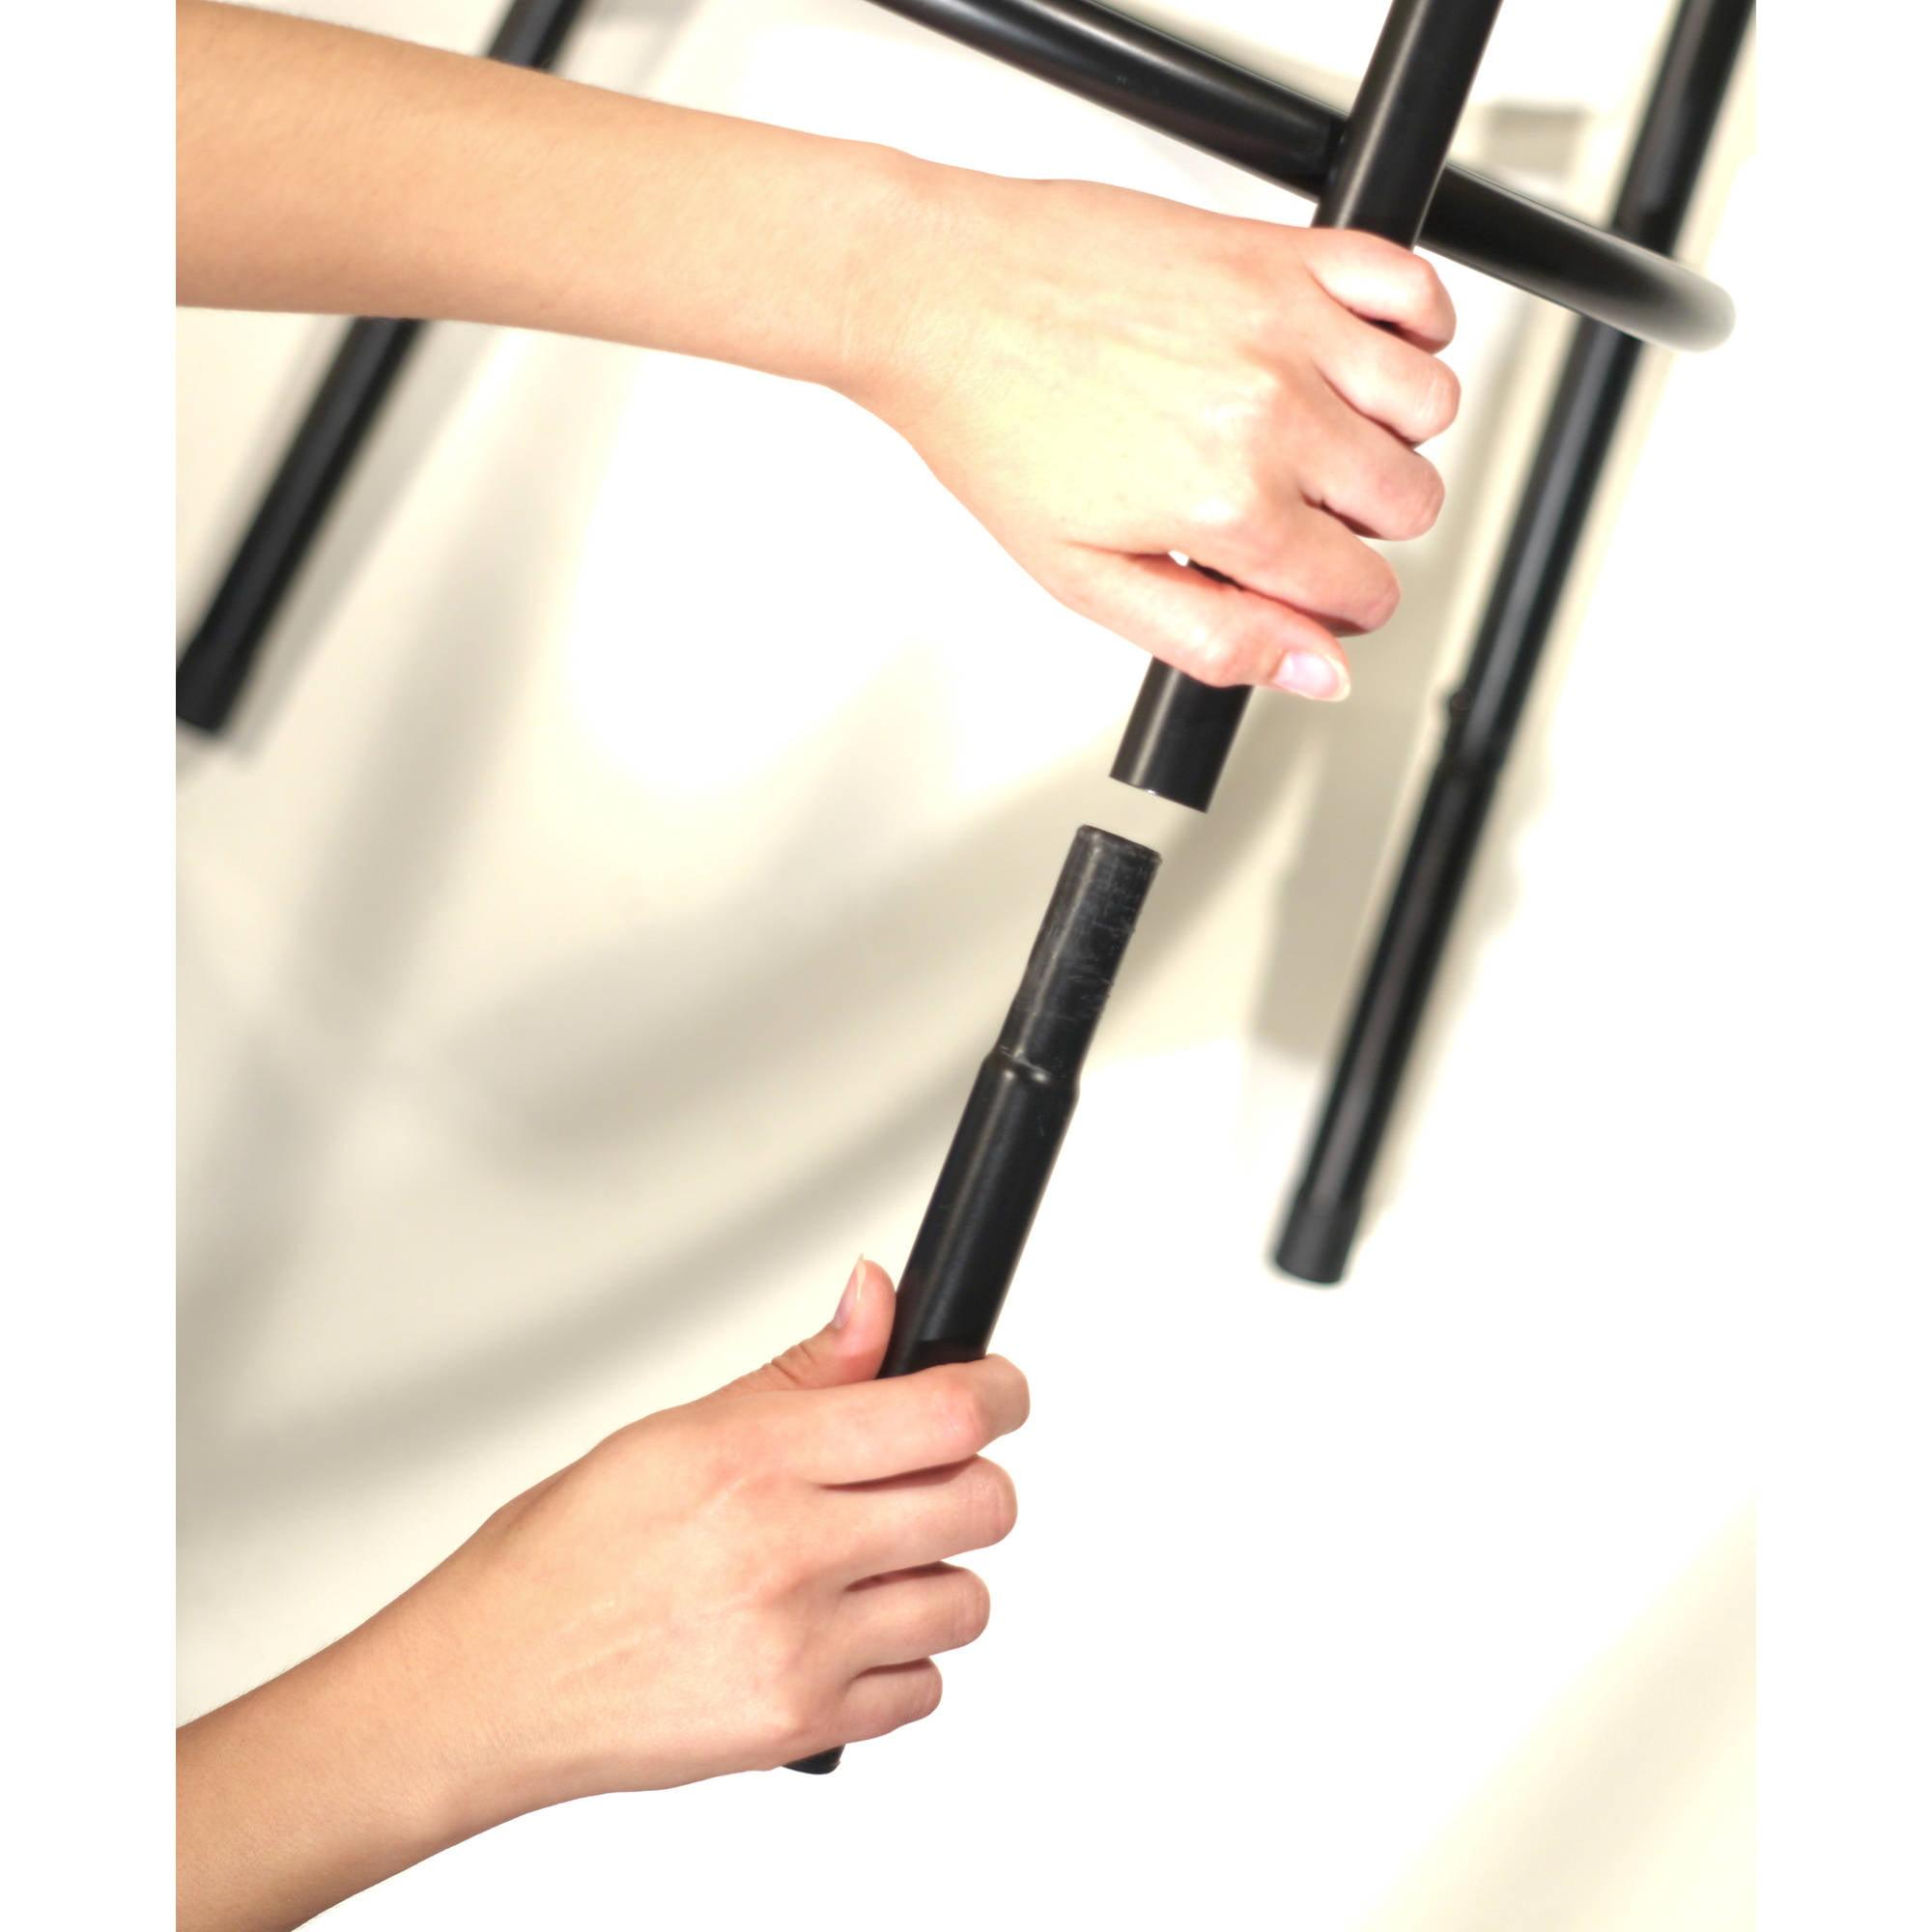 Delta Adjustable Metal Barstools 3 Piece Set Black Walmart